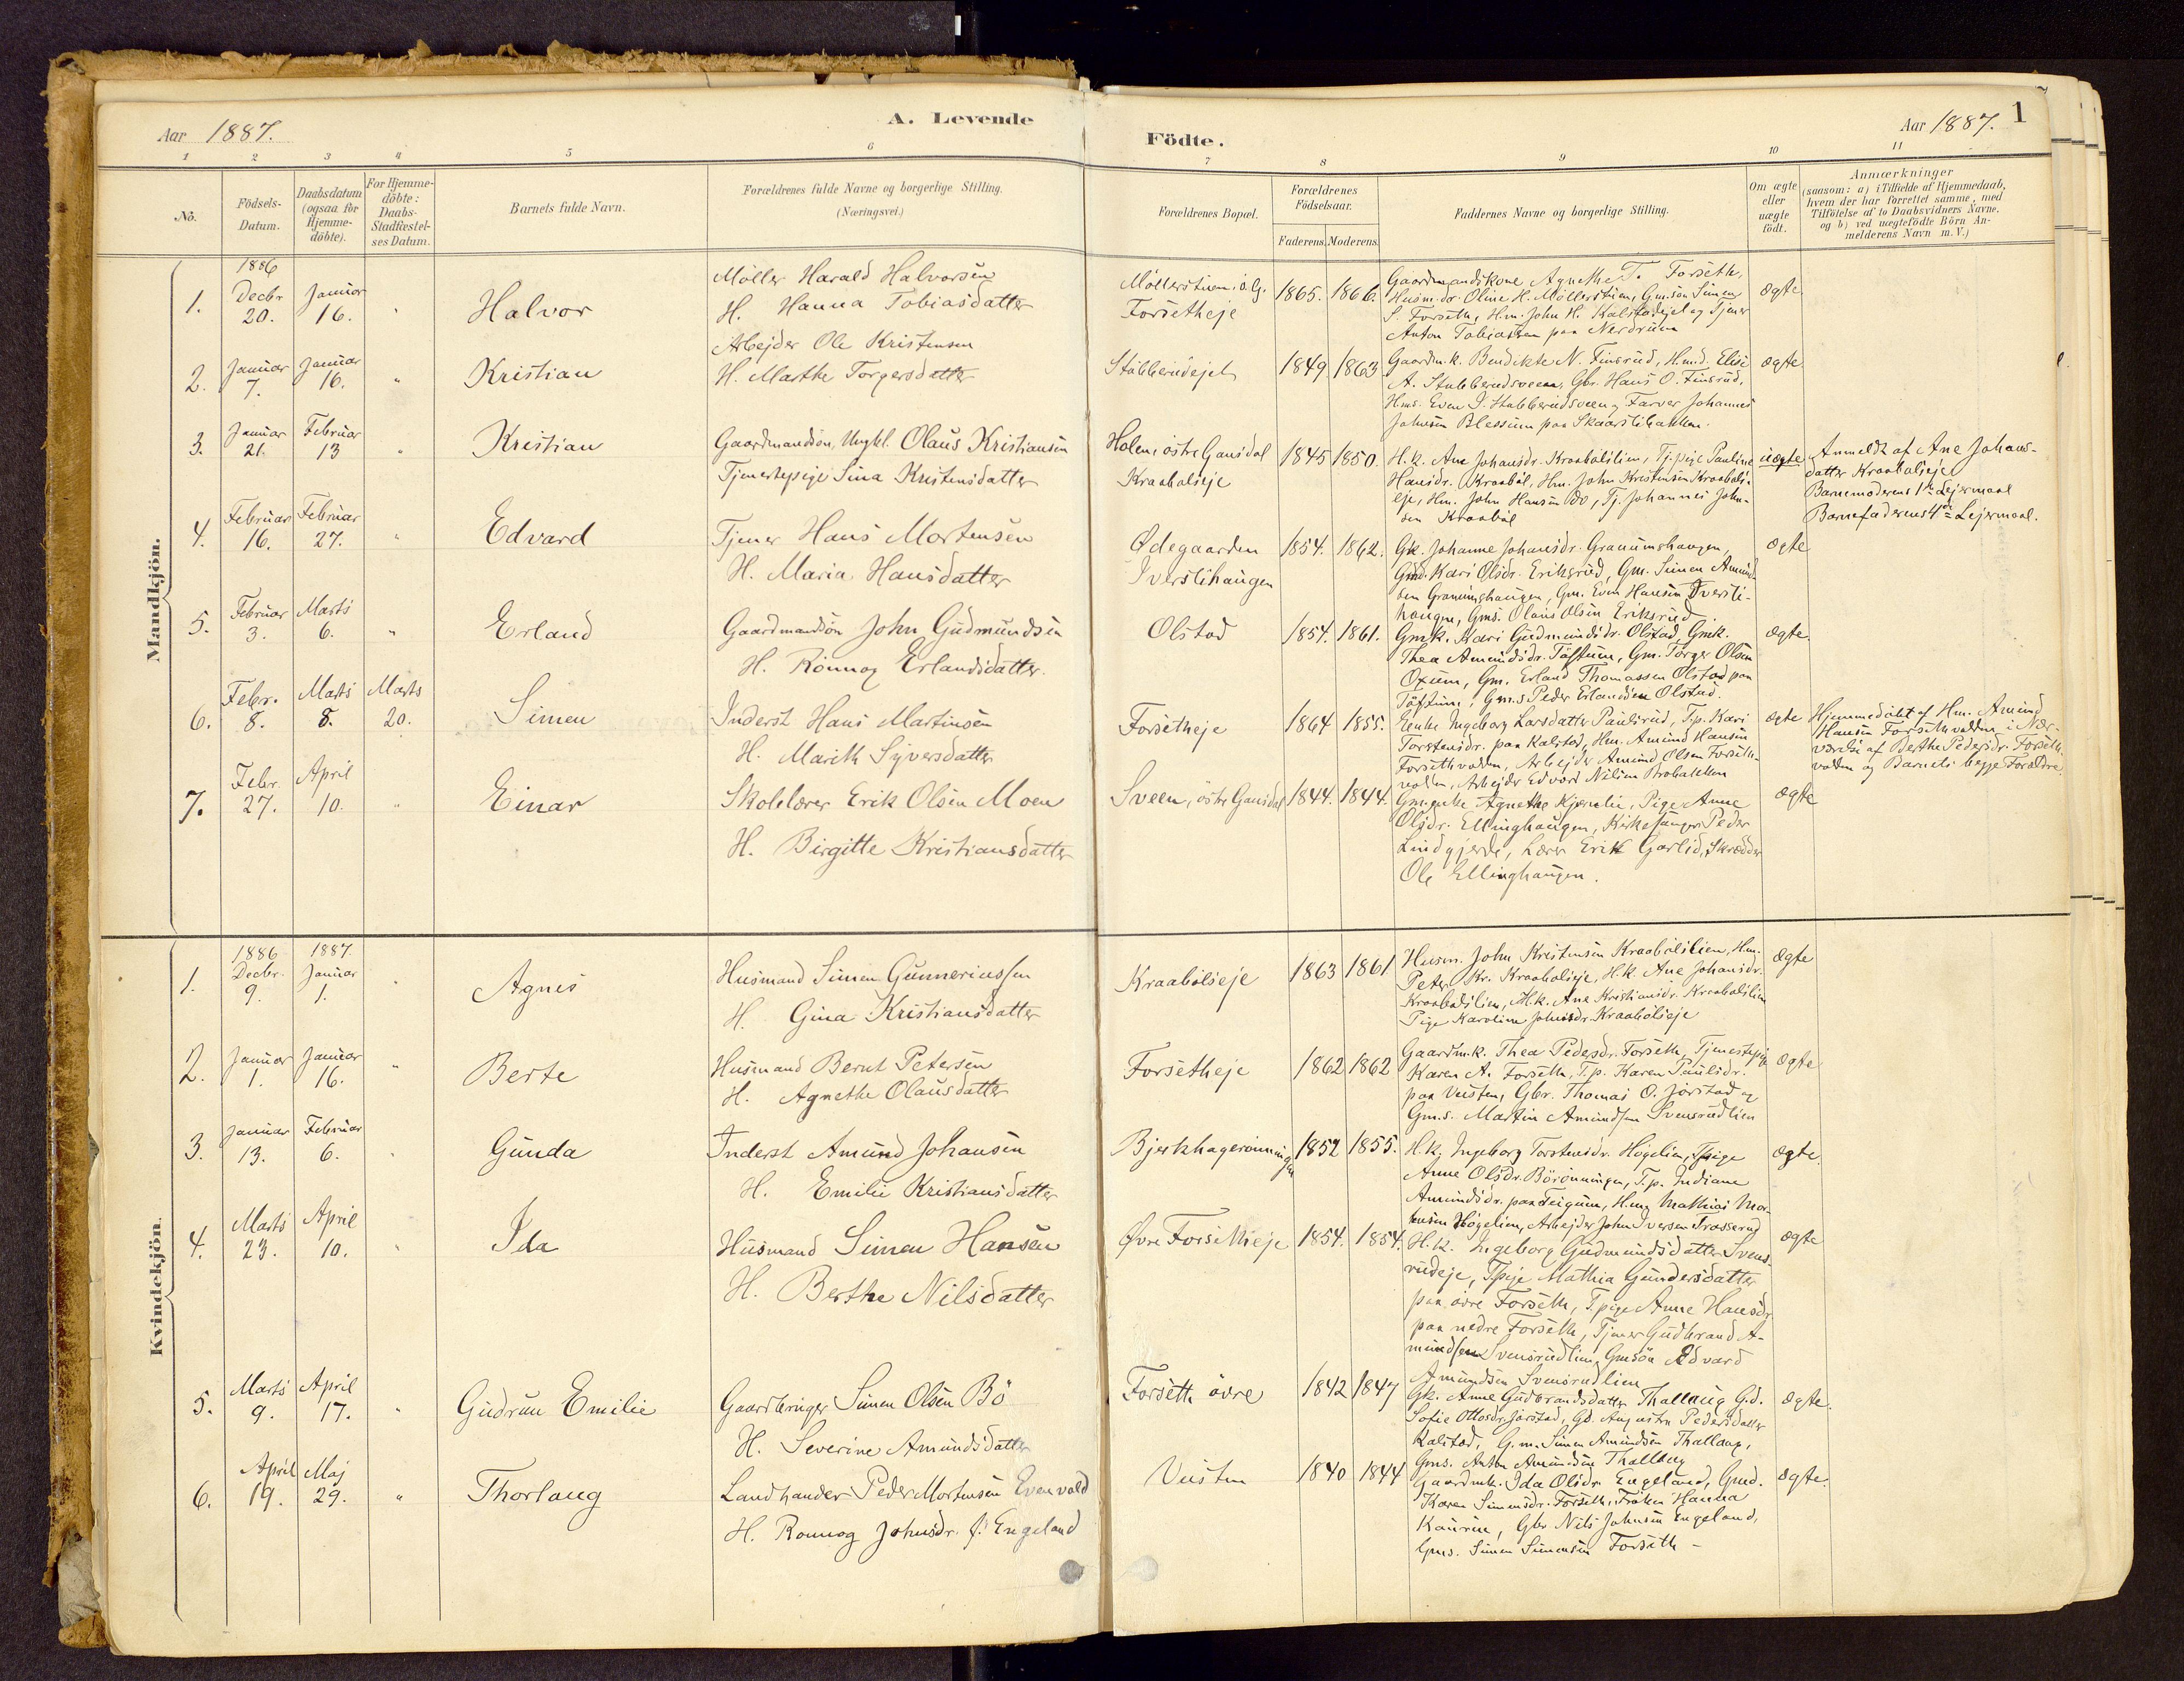 SAH, Vestre Gausdal prestekontor, Ministerialbok nr. 1, 1887-1914, s. 1